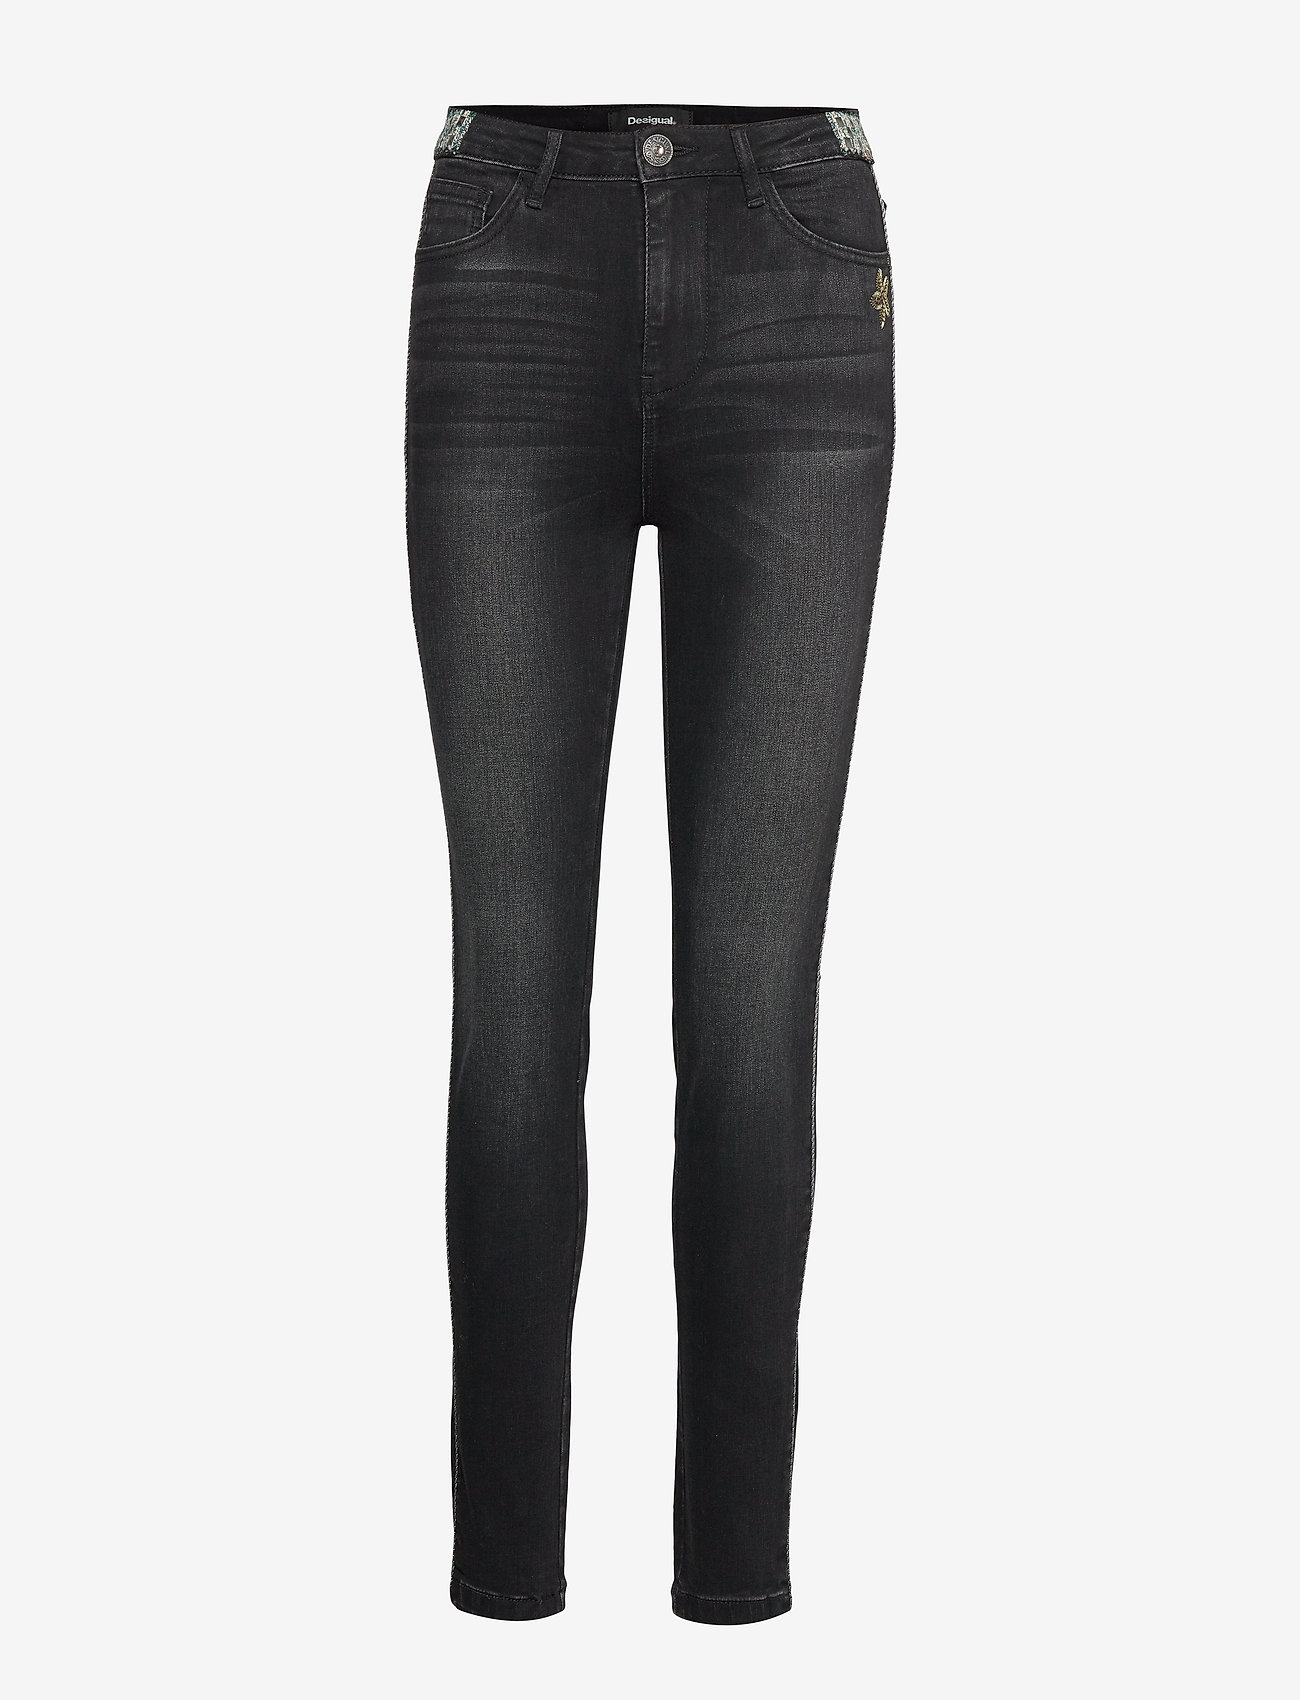 Desigual - DENIM NEW YOR - skinny jeans - denim black wash - 0